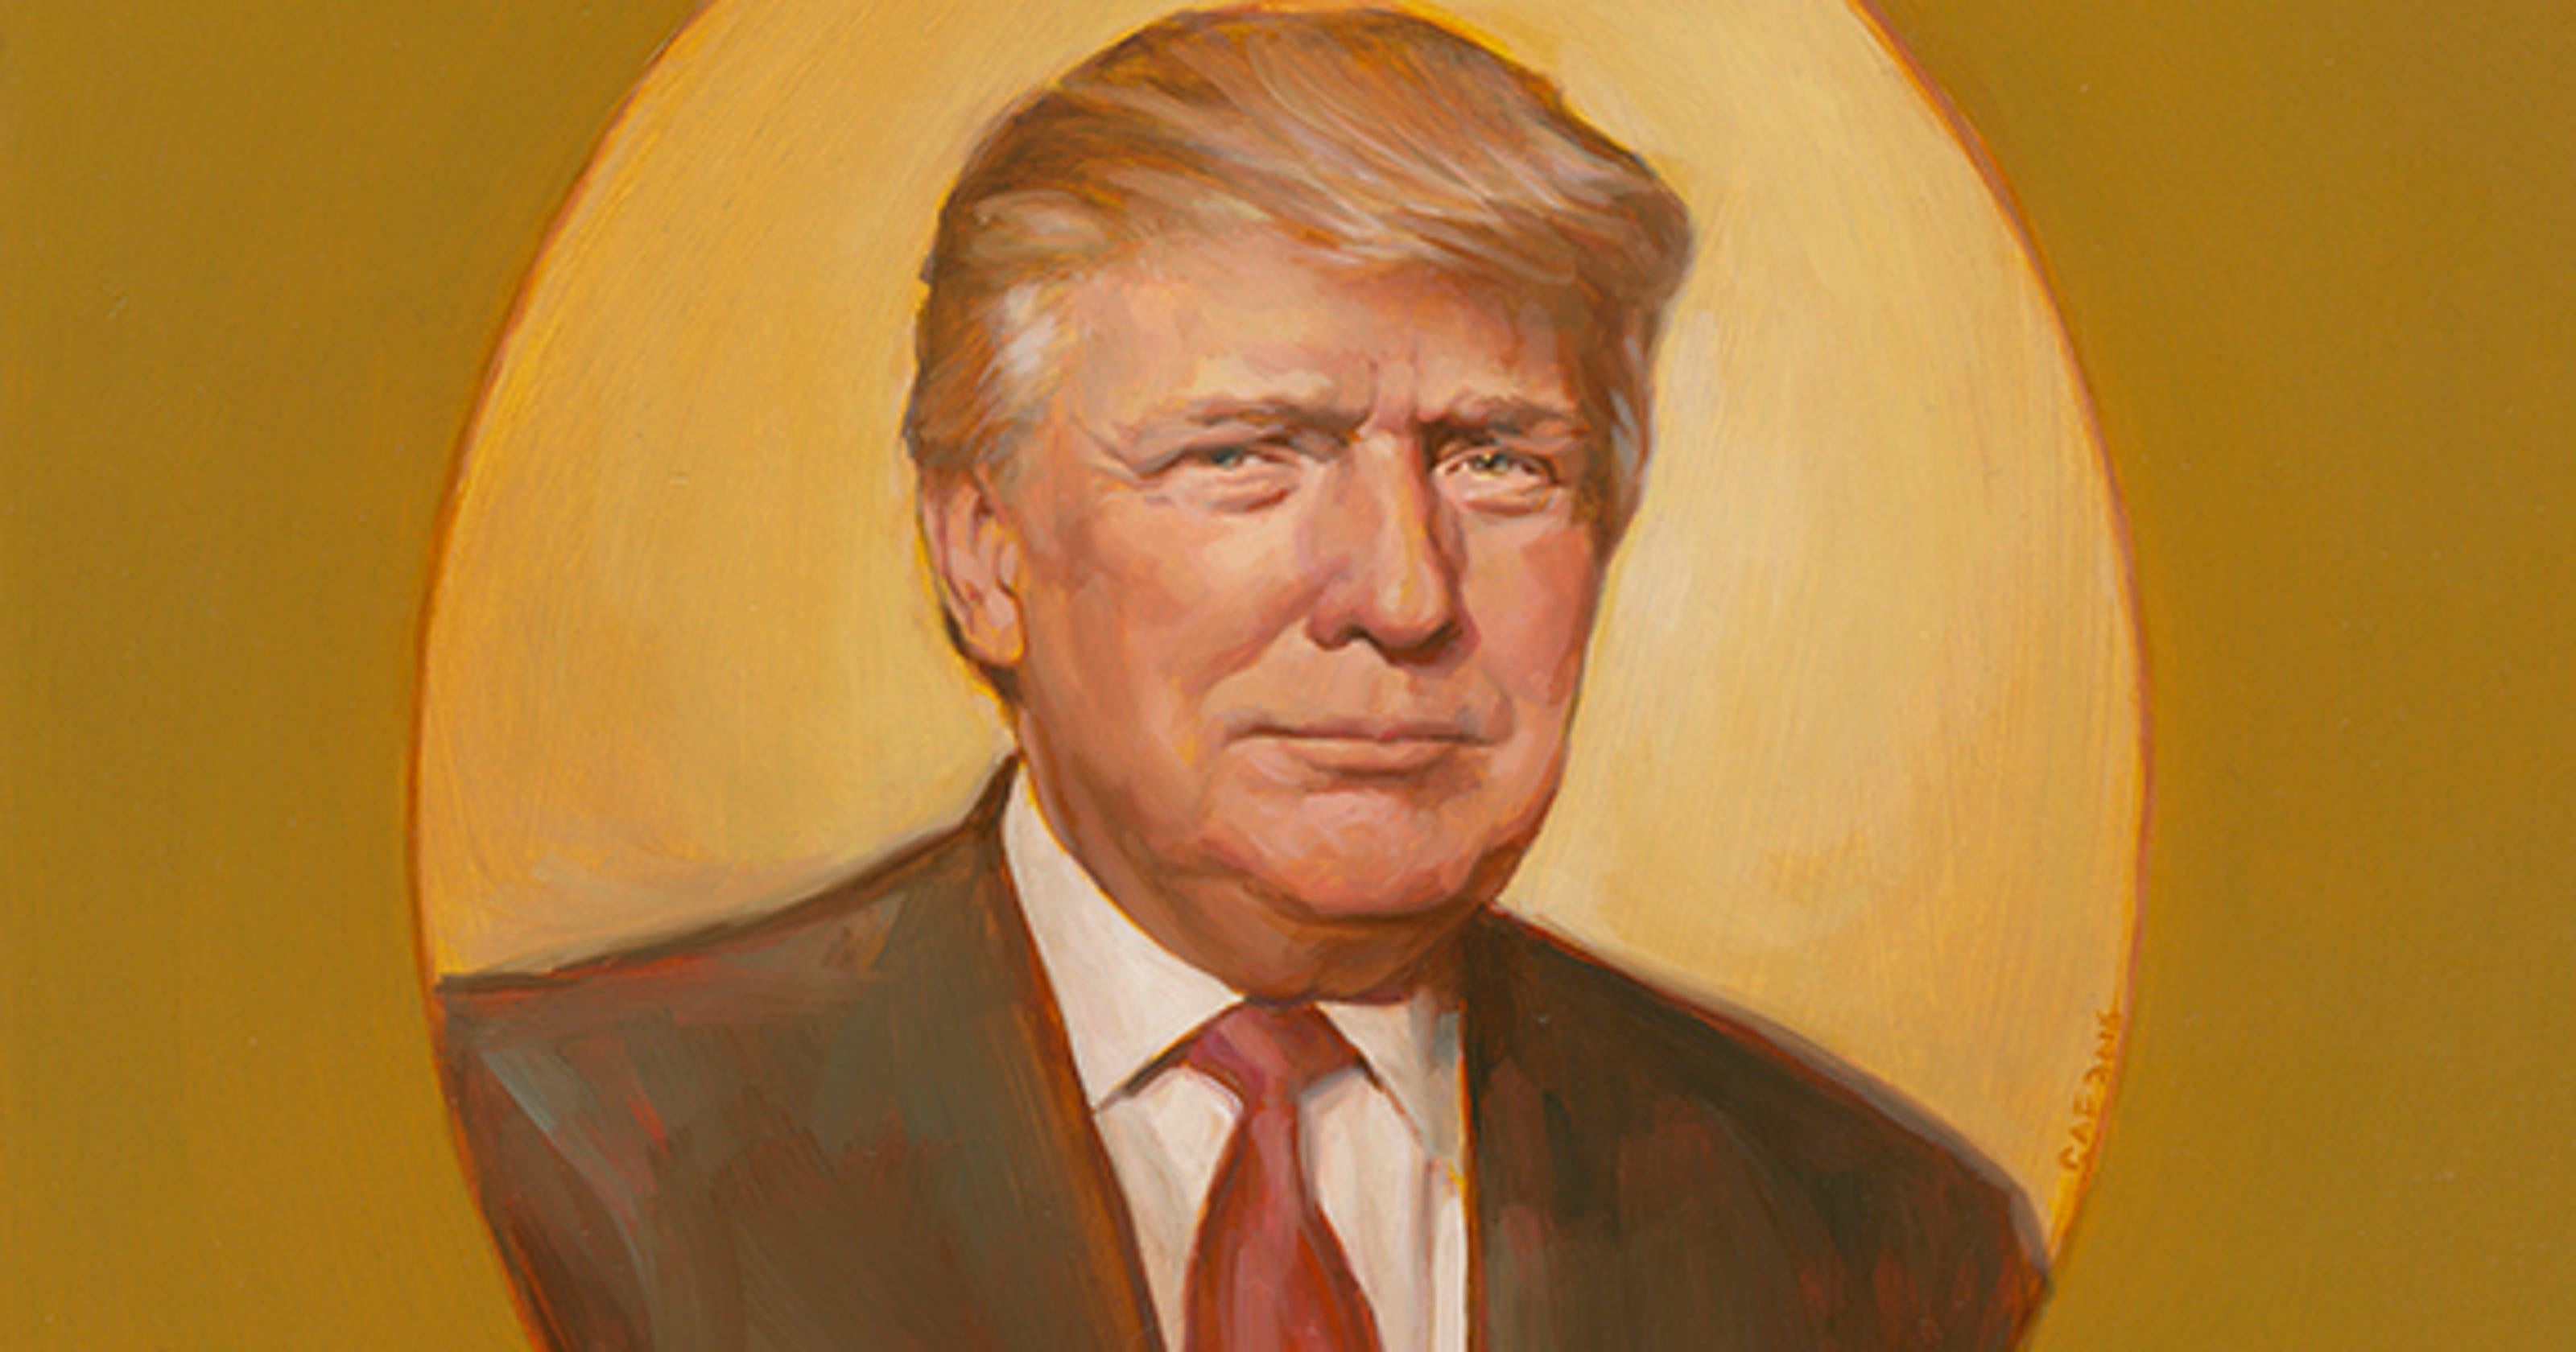 Image result for portrait of trump